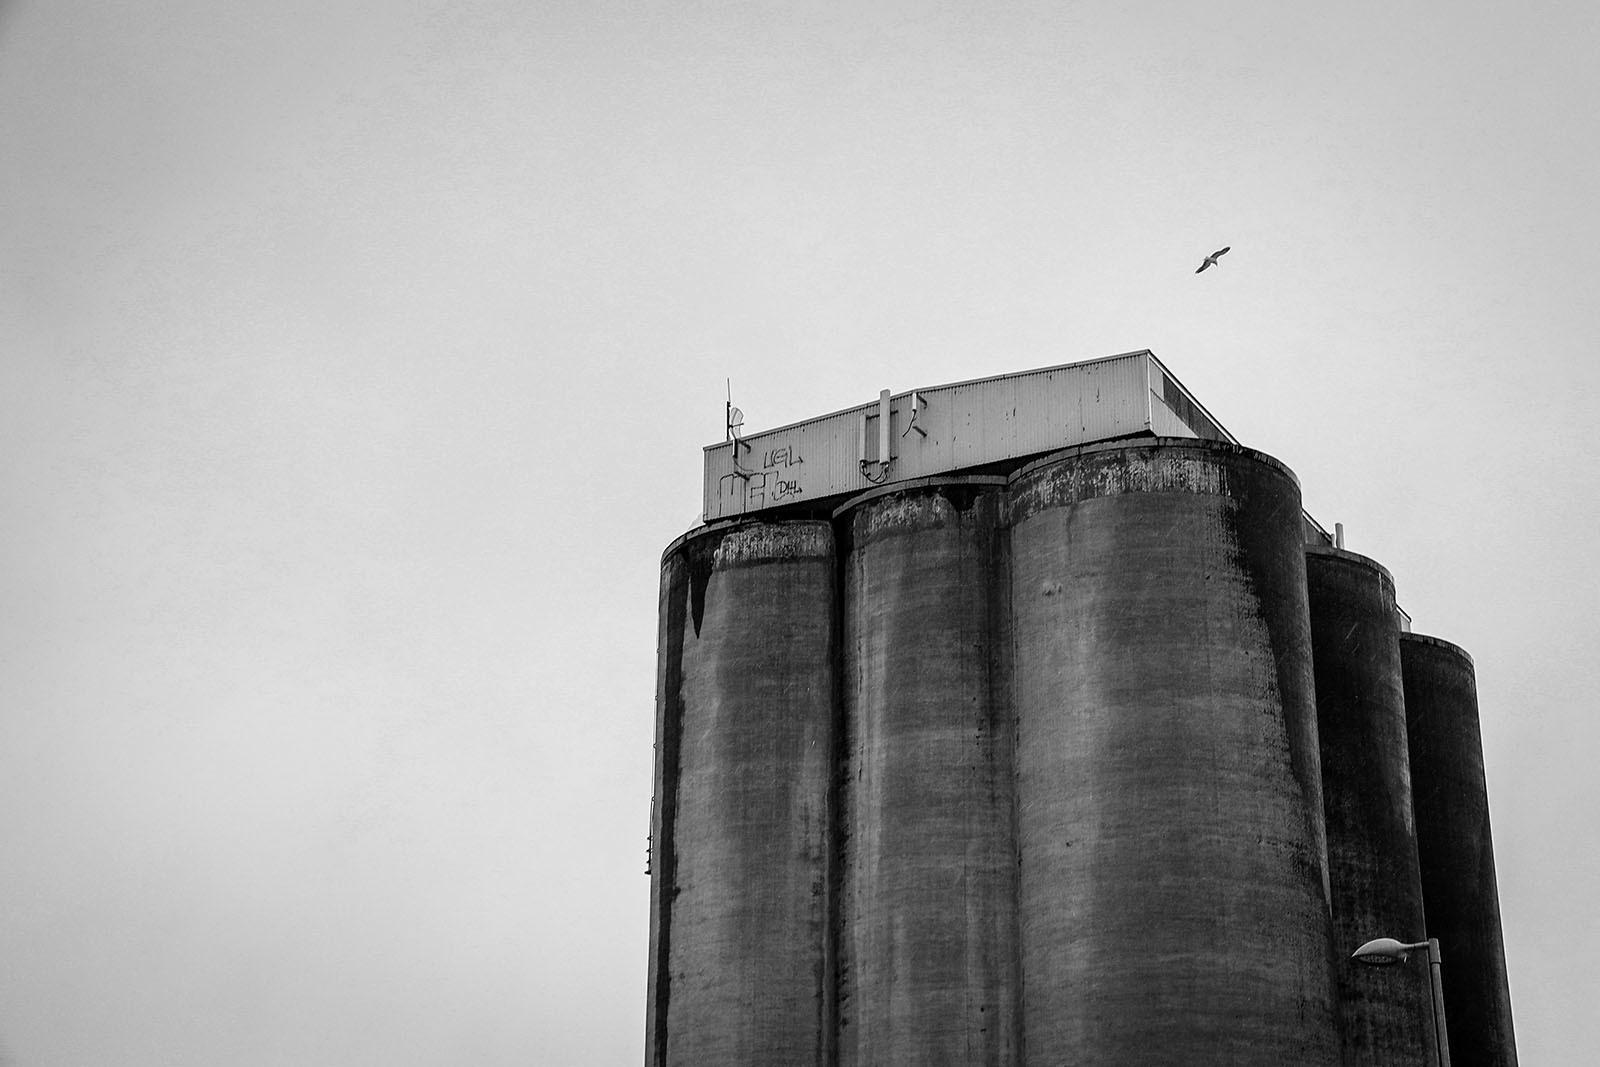 Node-infrastruktur-silo-rapport-1